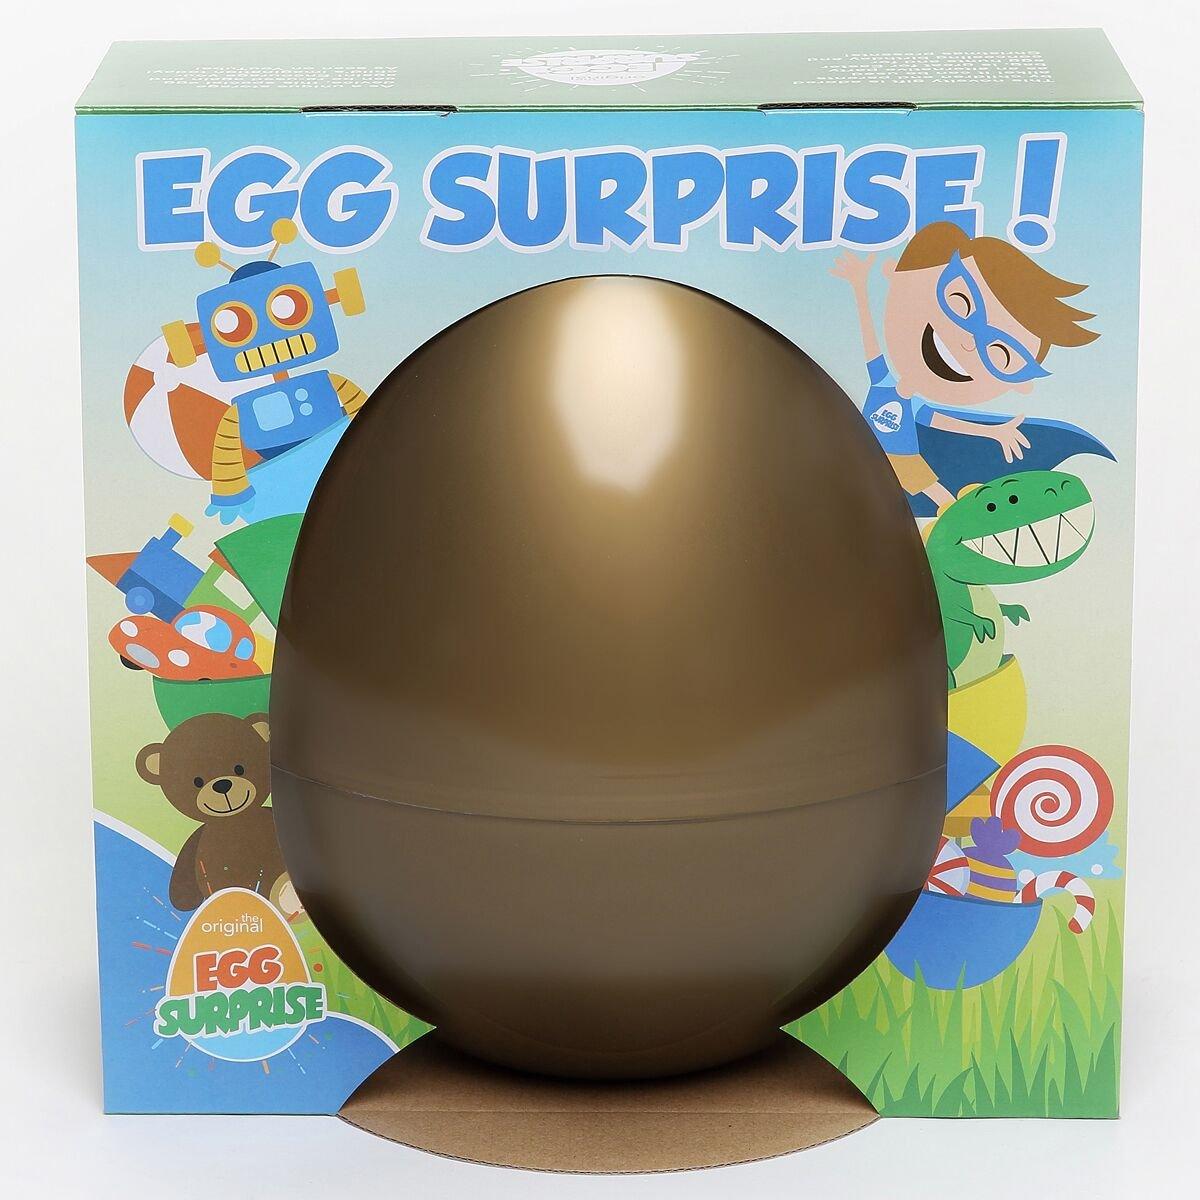 Blue The Original Egg Surprise,GIANT 14 INCH